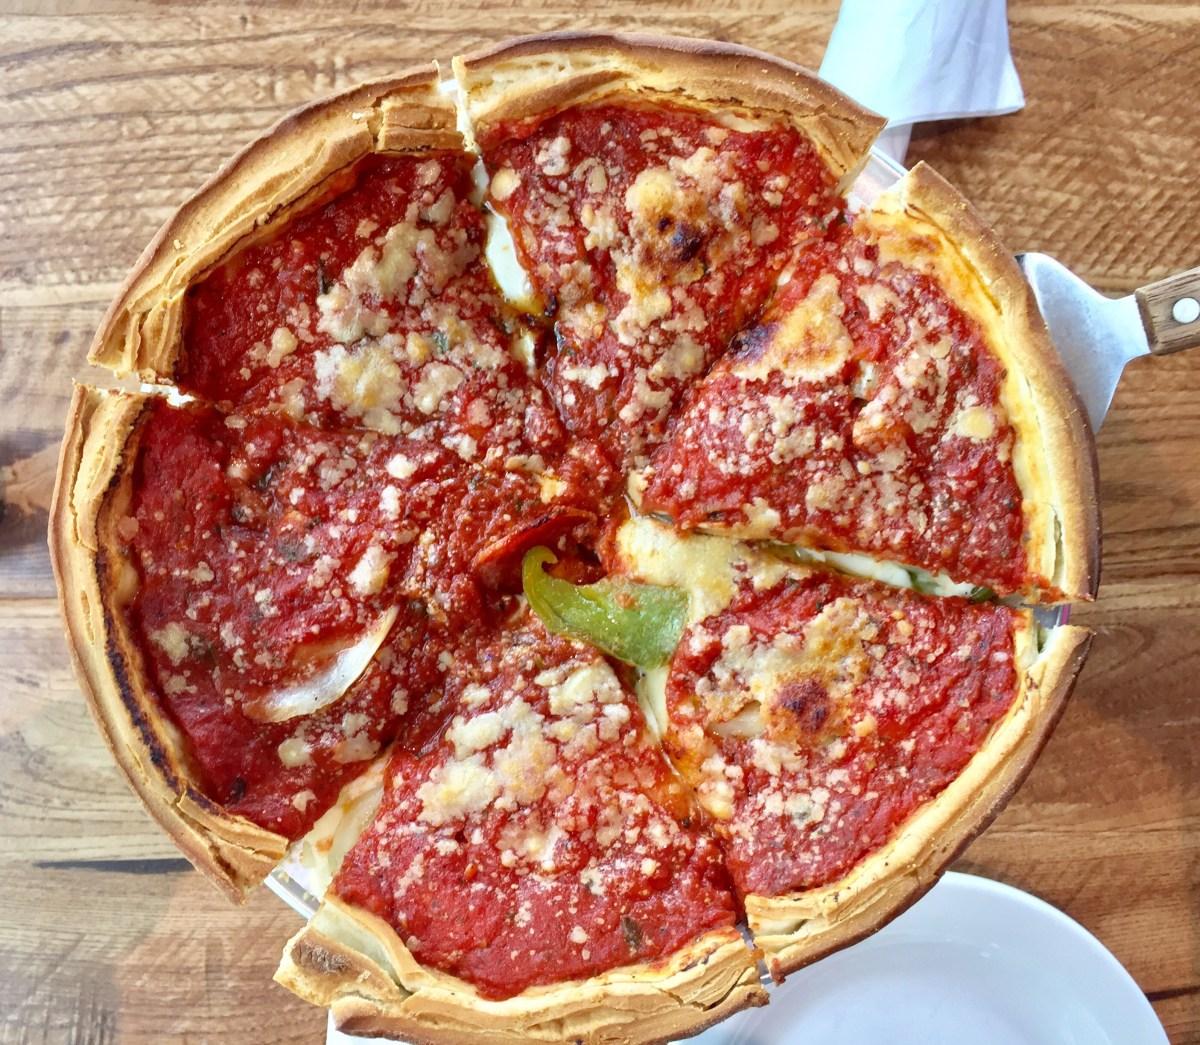 Giordano's Deep Dish Pizza #deepdishpizz #pizza #giordanos #giordanoslasvegas #vegas #lasvegas #ballys #grandbazaarshops